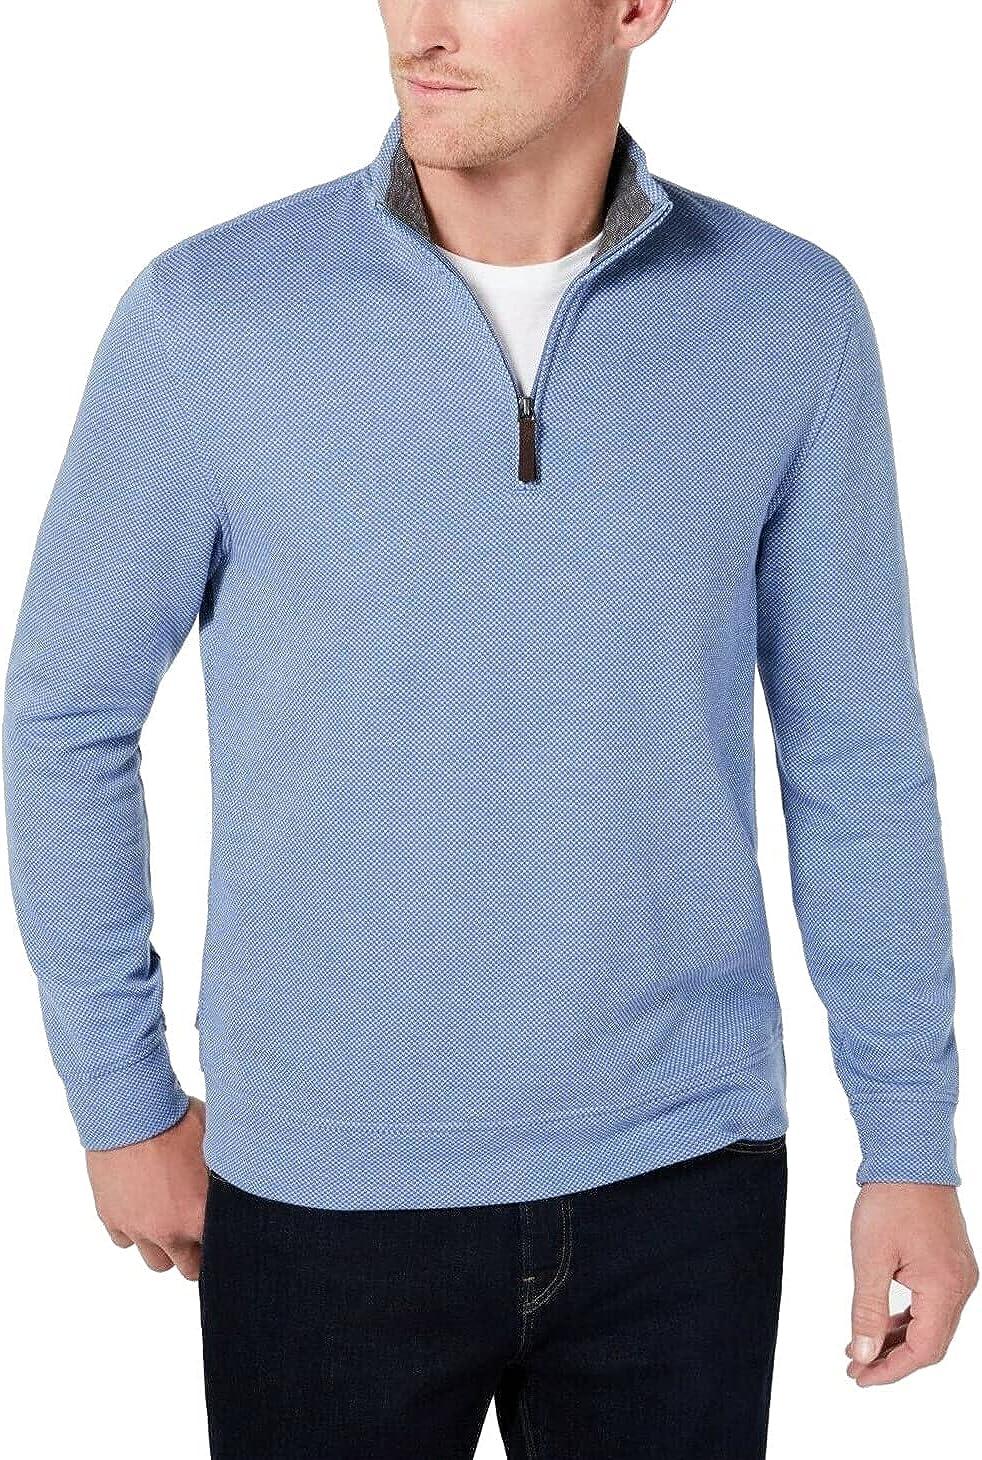 Tasso Elba Mens Sweater Small Chambray Quarter-Zip Pullover Blue S